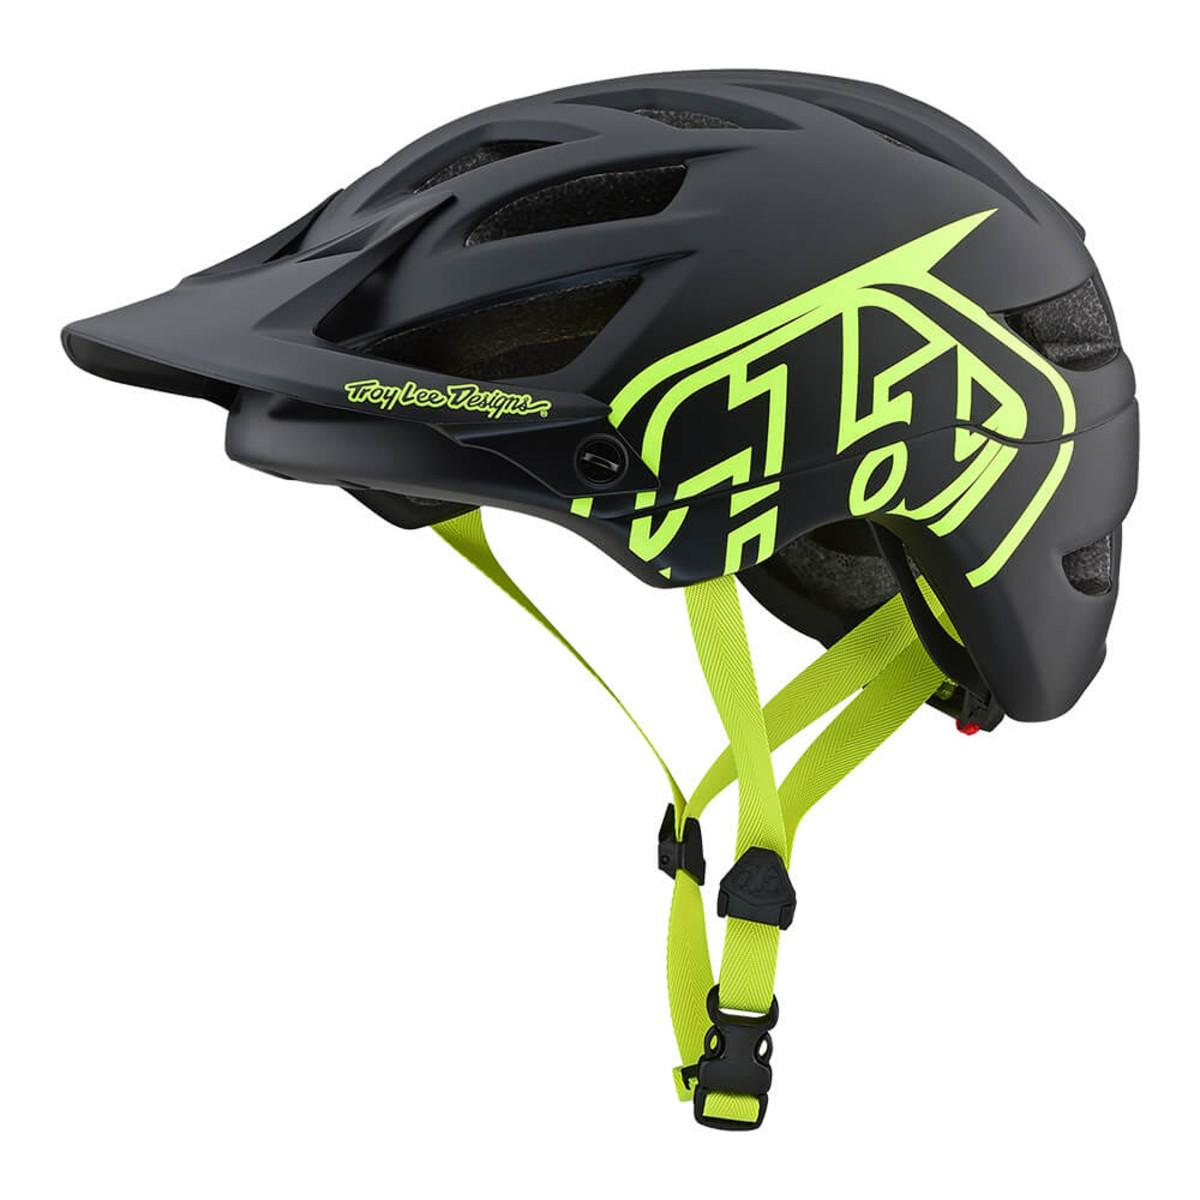 Вело шлем TLD A1 Classic Drone [Black / Flo Yellow] размер XL/XXL